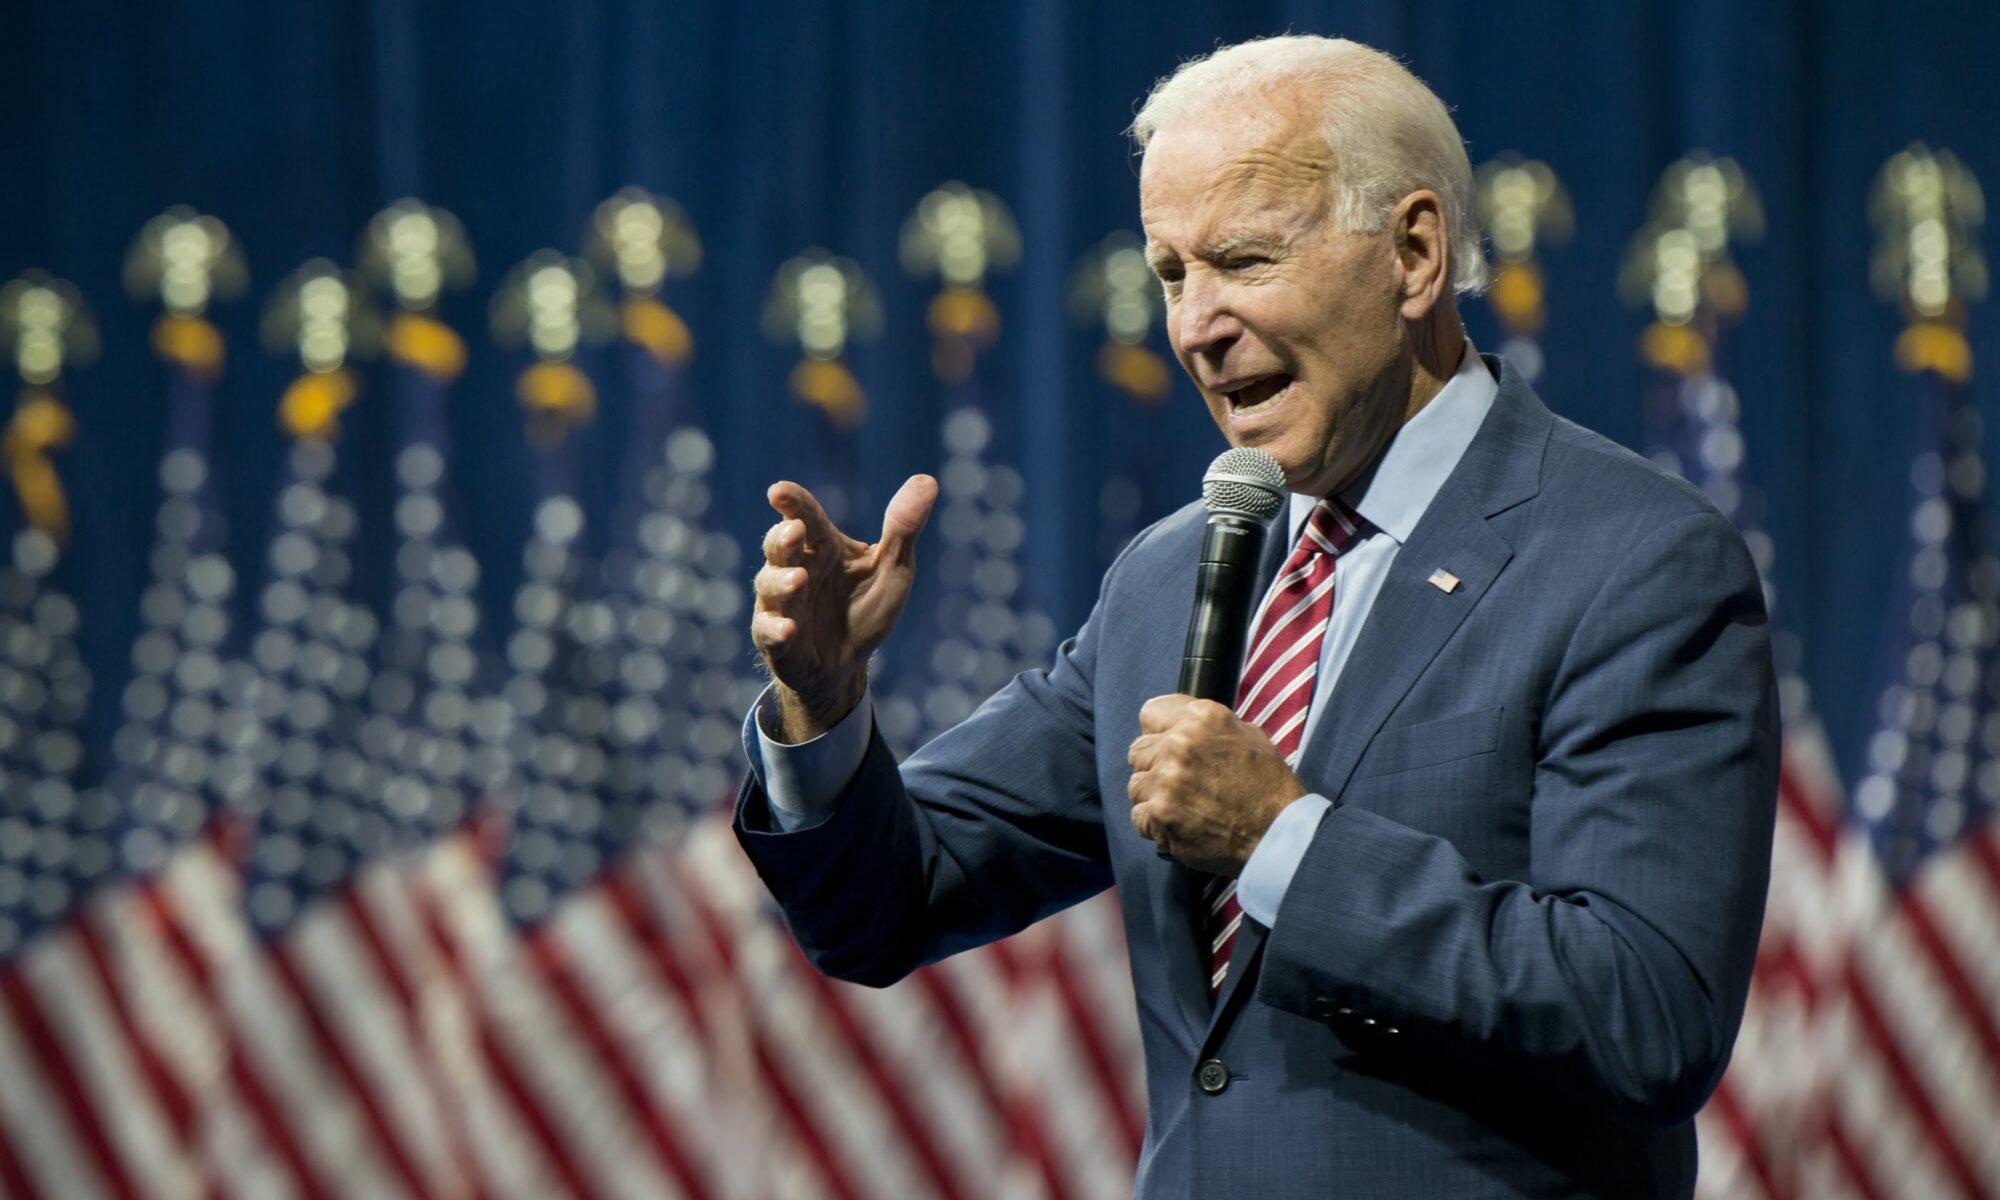 Joe Biden speaks at a rally